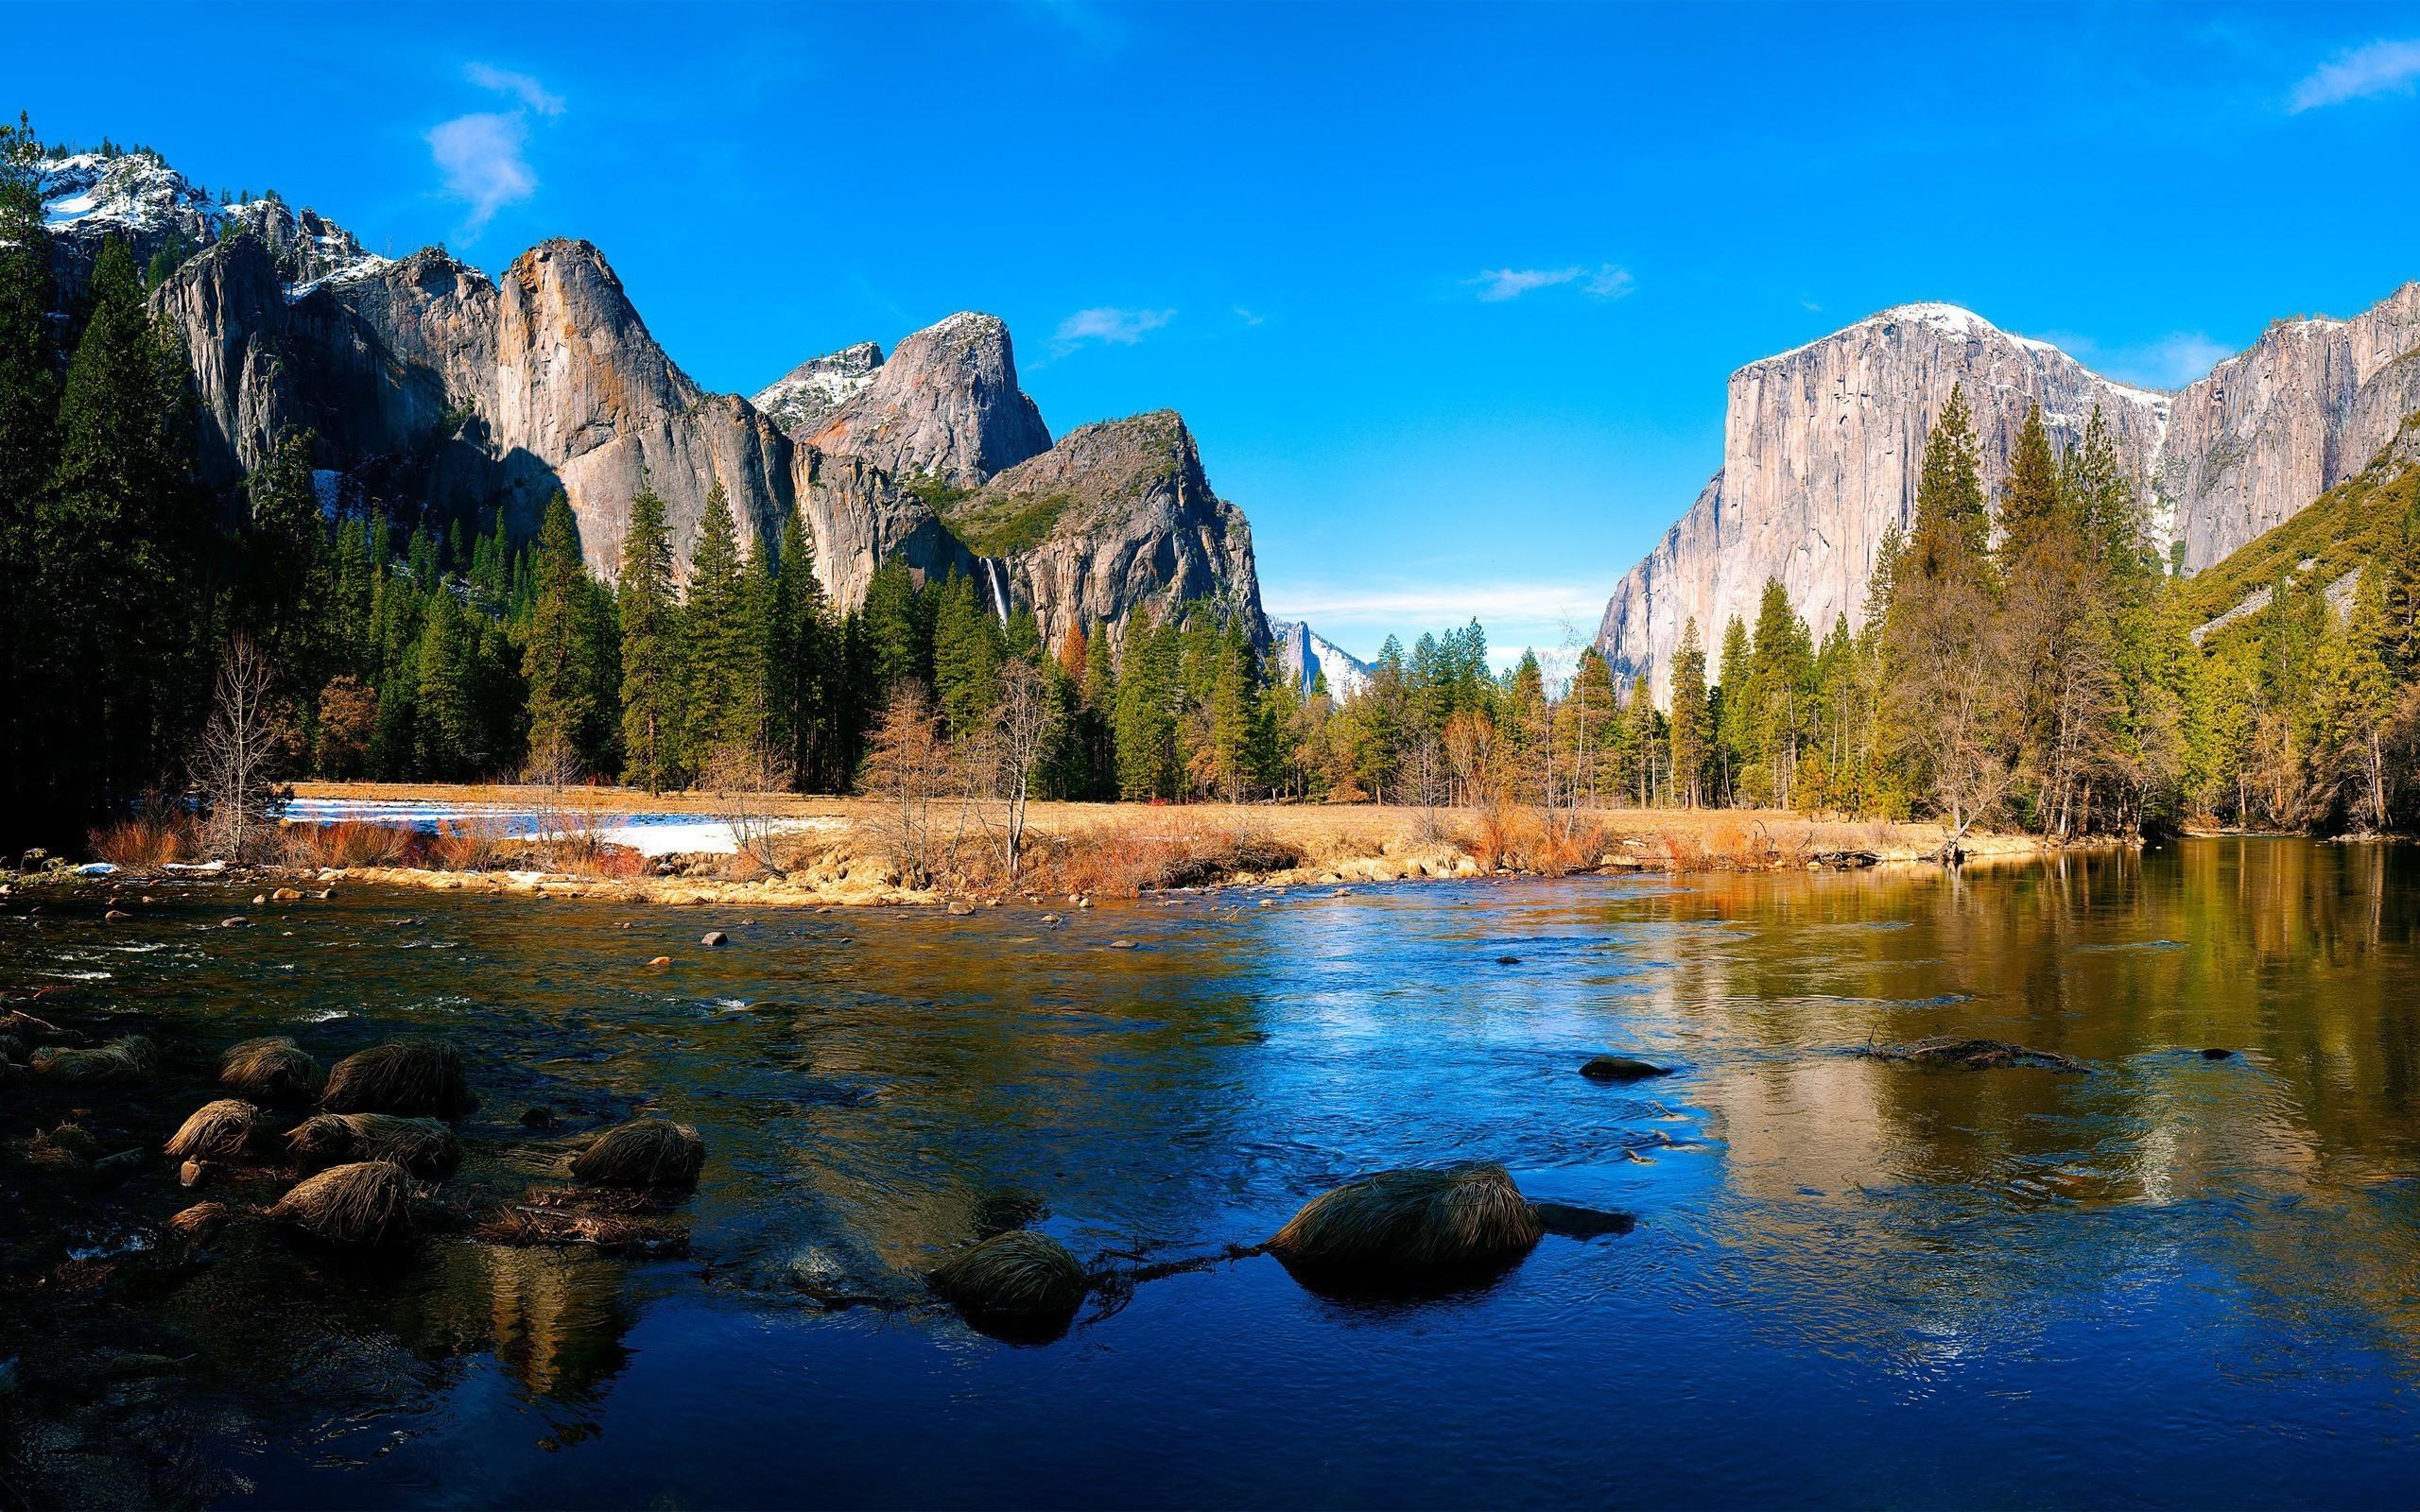 Yosemite Valley Wallpaper Apple Wallpaper Yosemite Apple 8K Pics 2560x1600